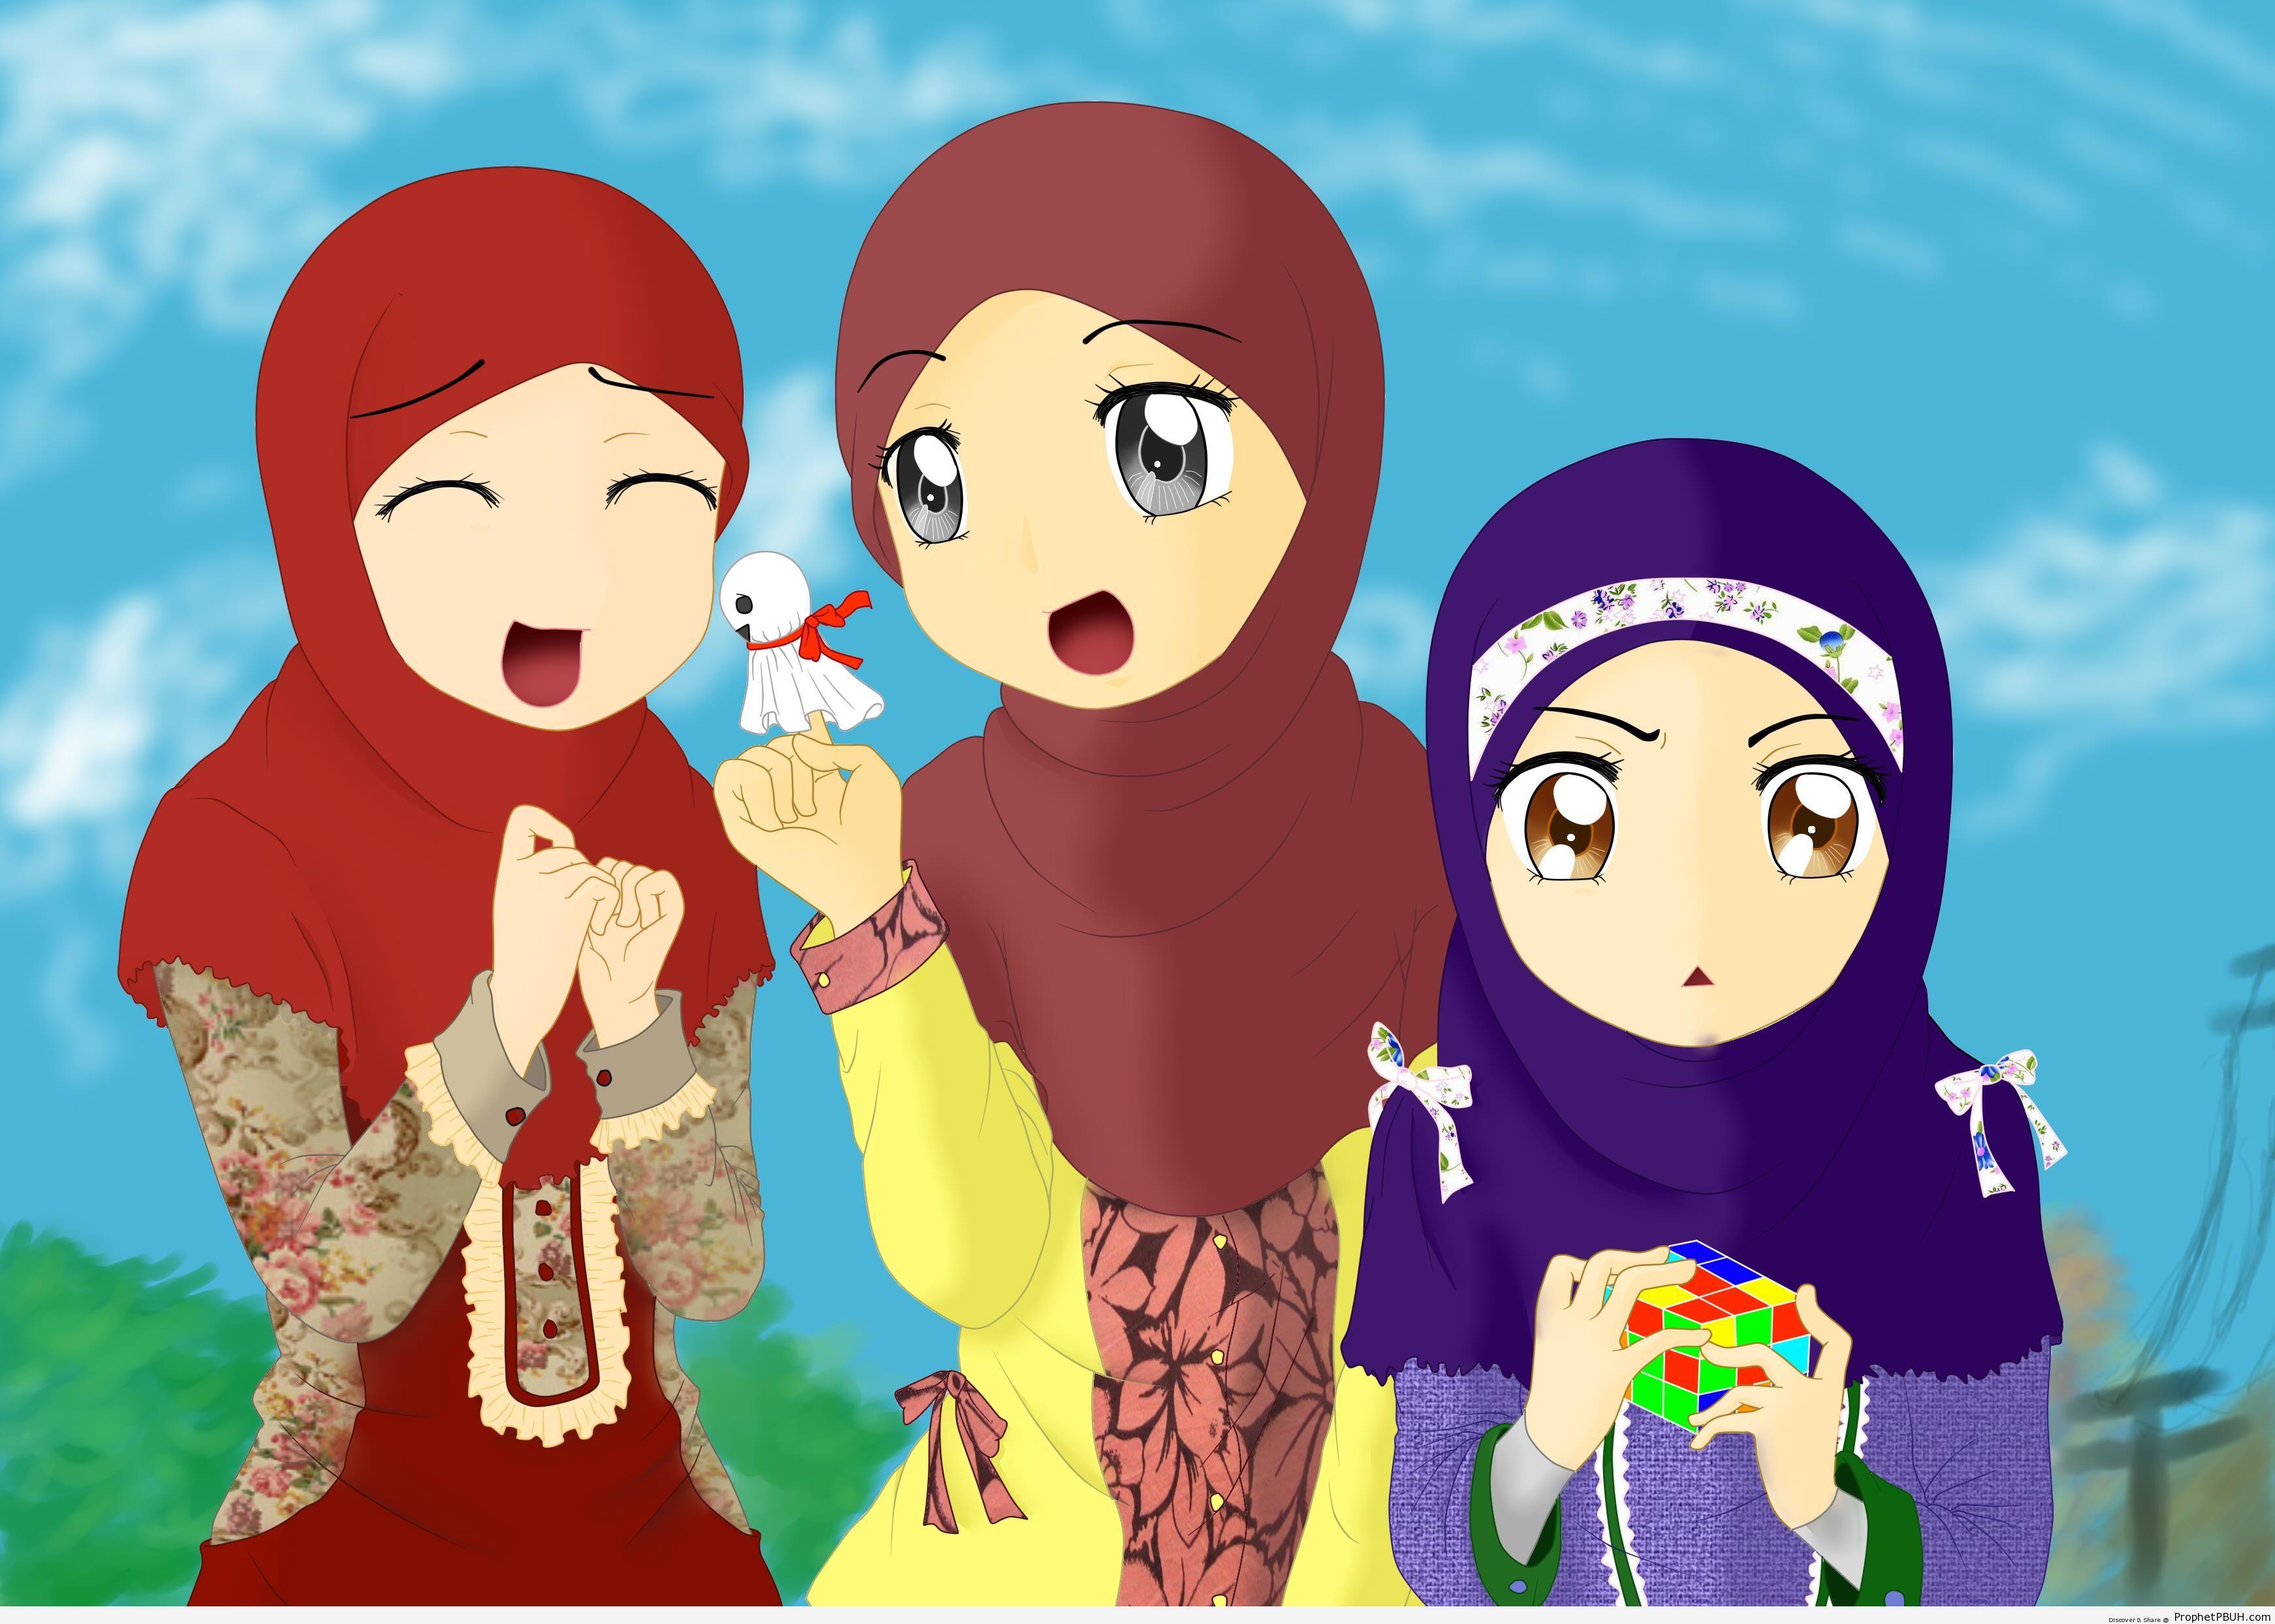 Three Muslim Girls Manga Anime Style Drawing